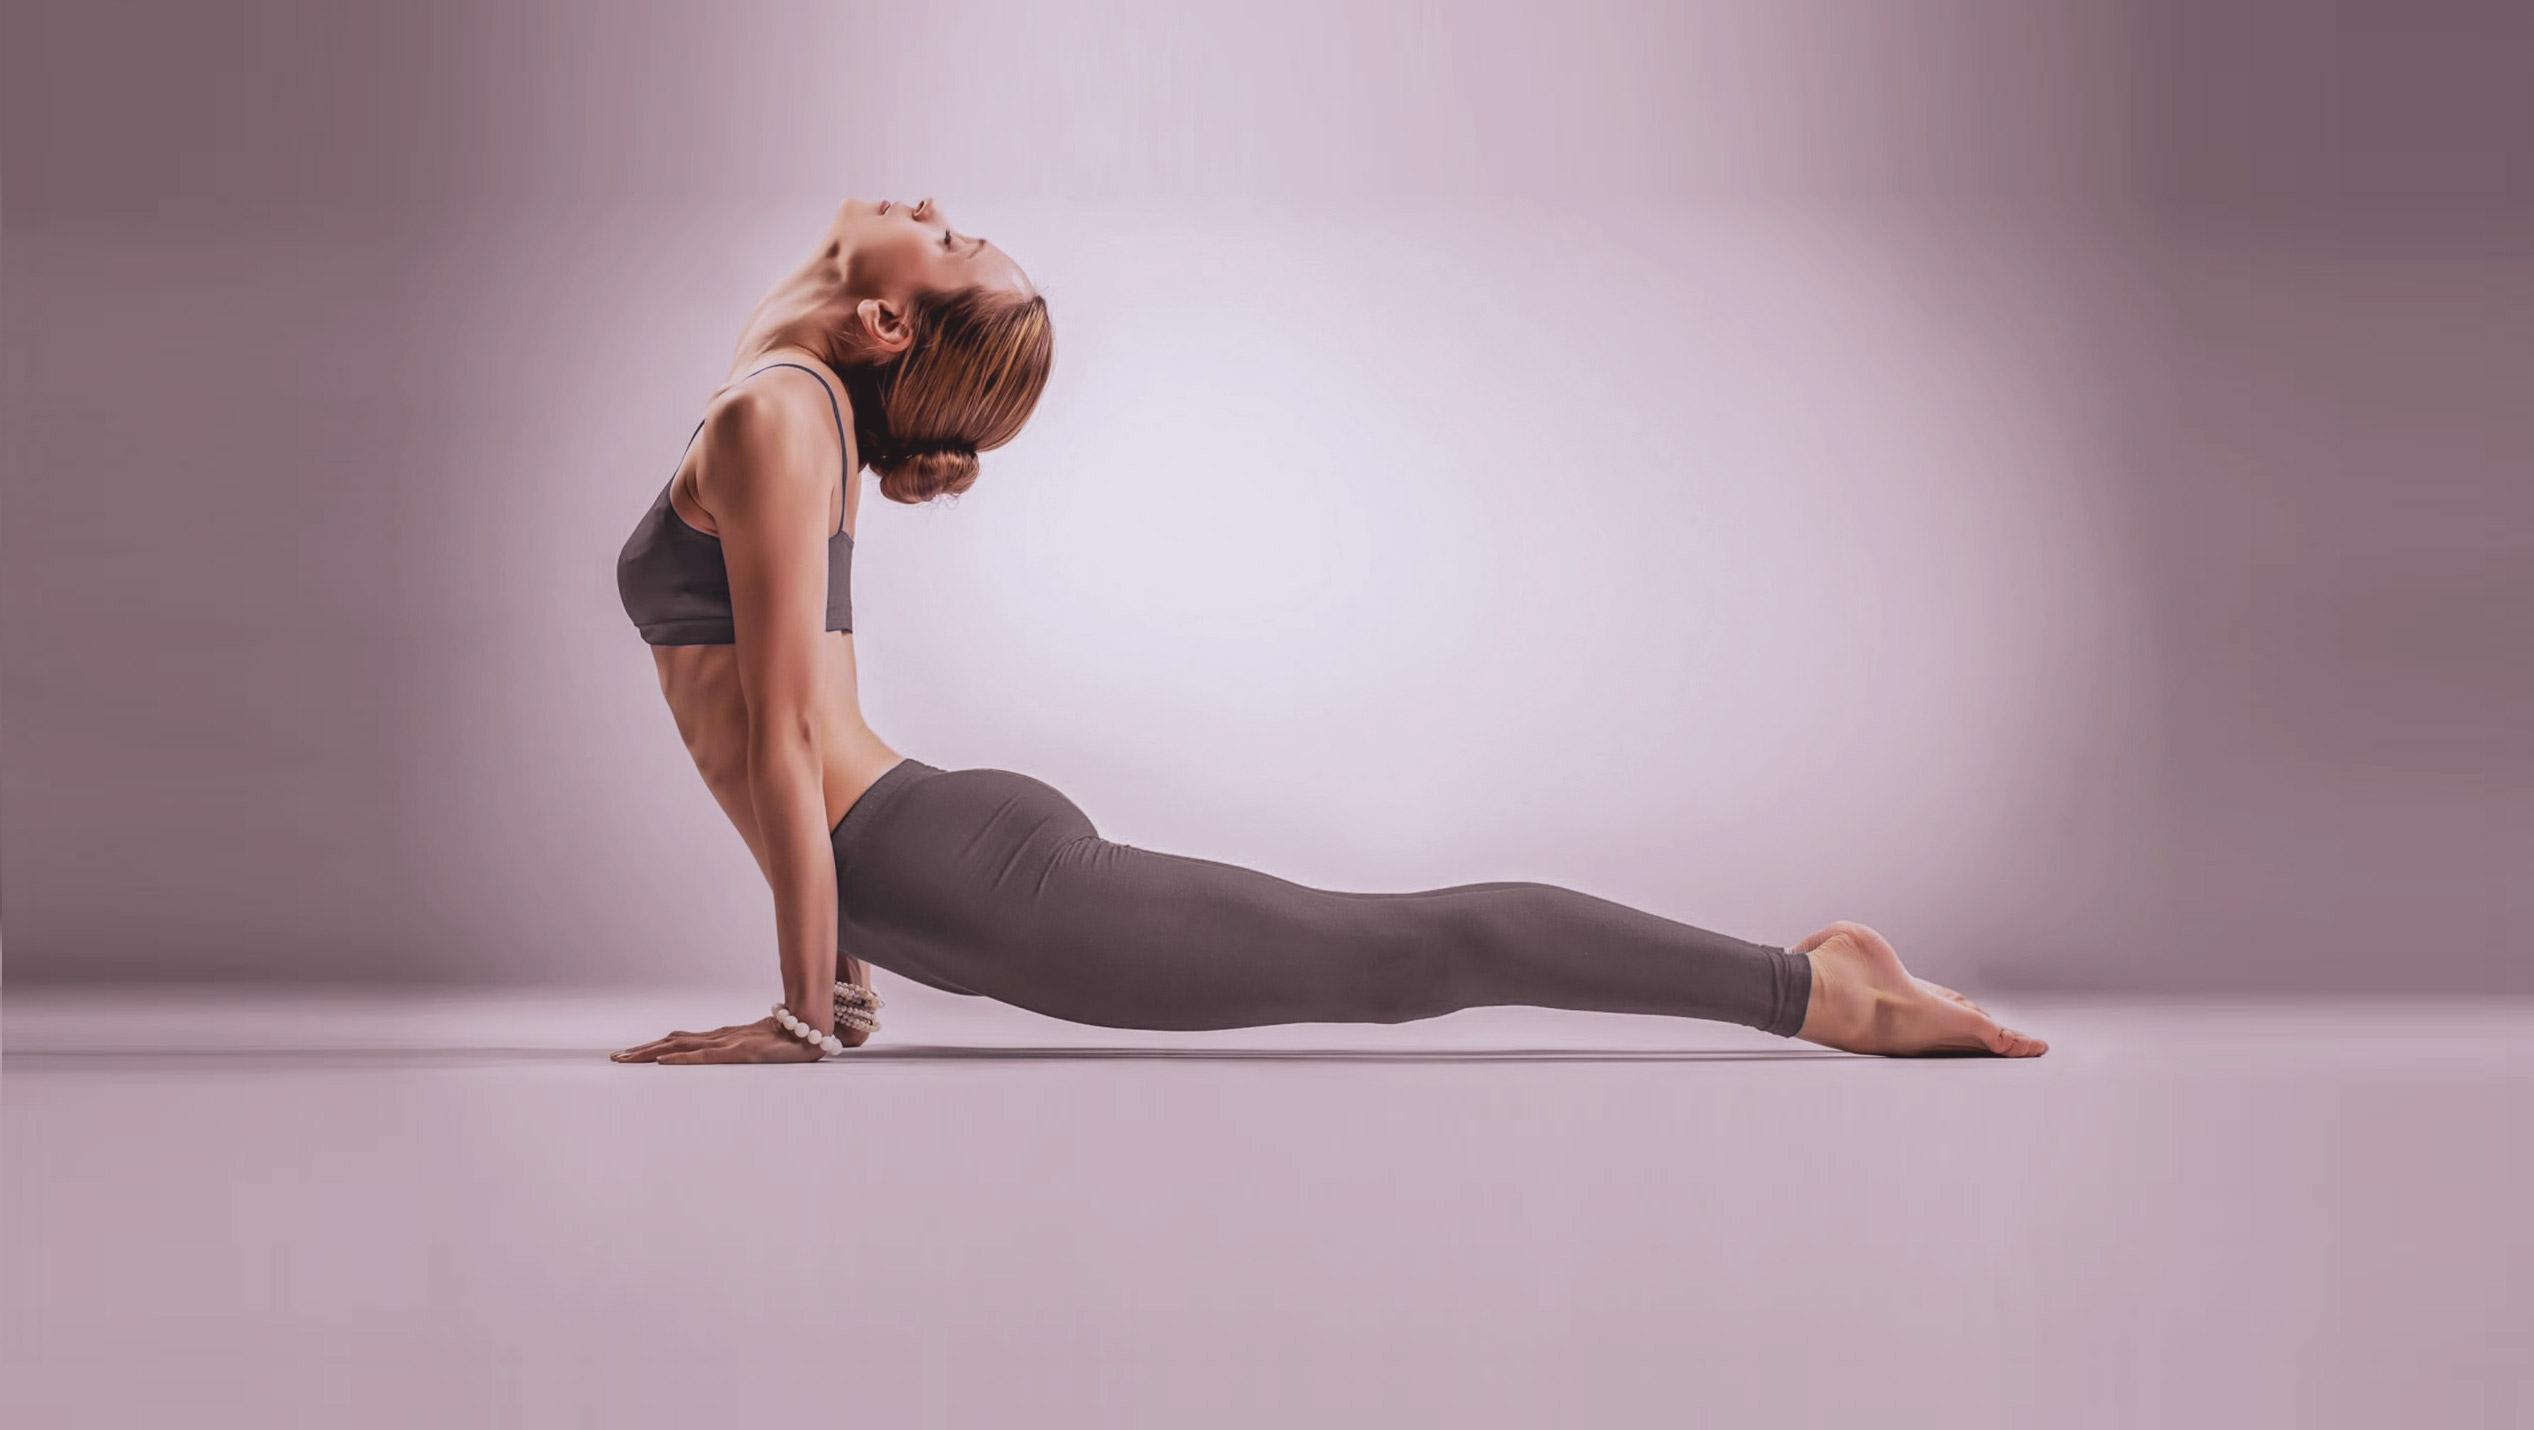 yoga_bg-vert+horiz-stretch-3wide+clr-dk-2